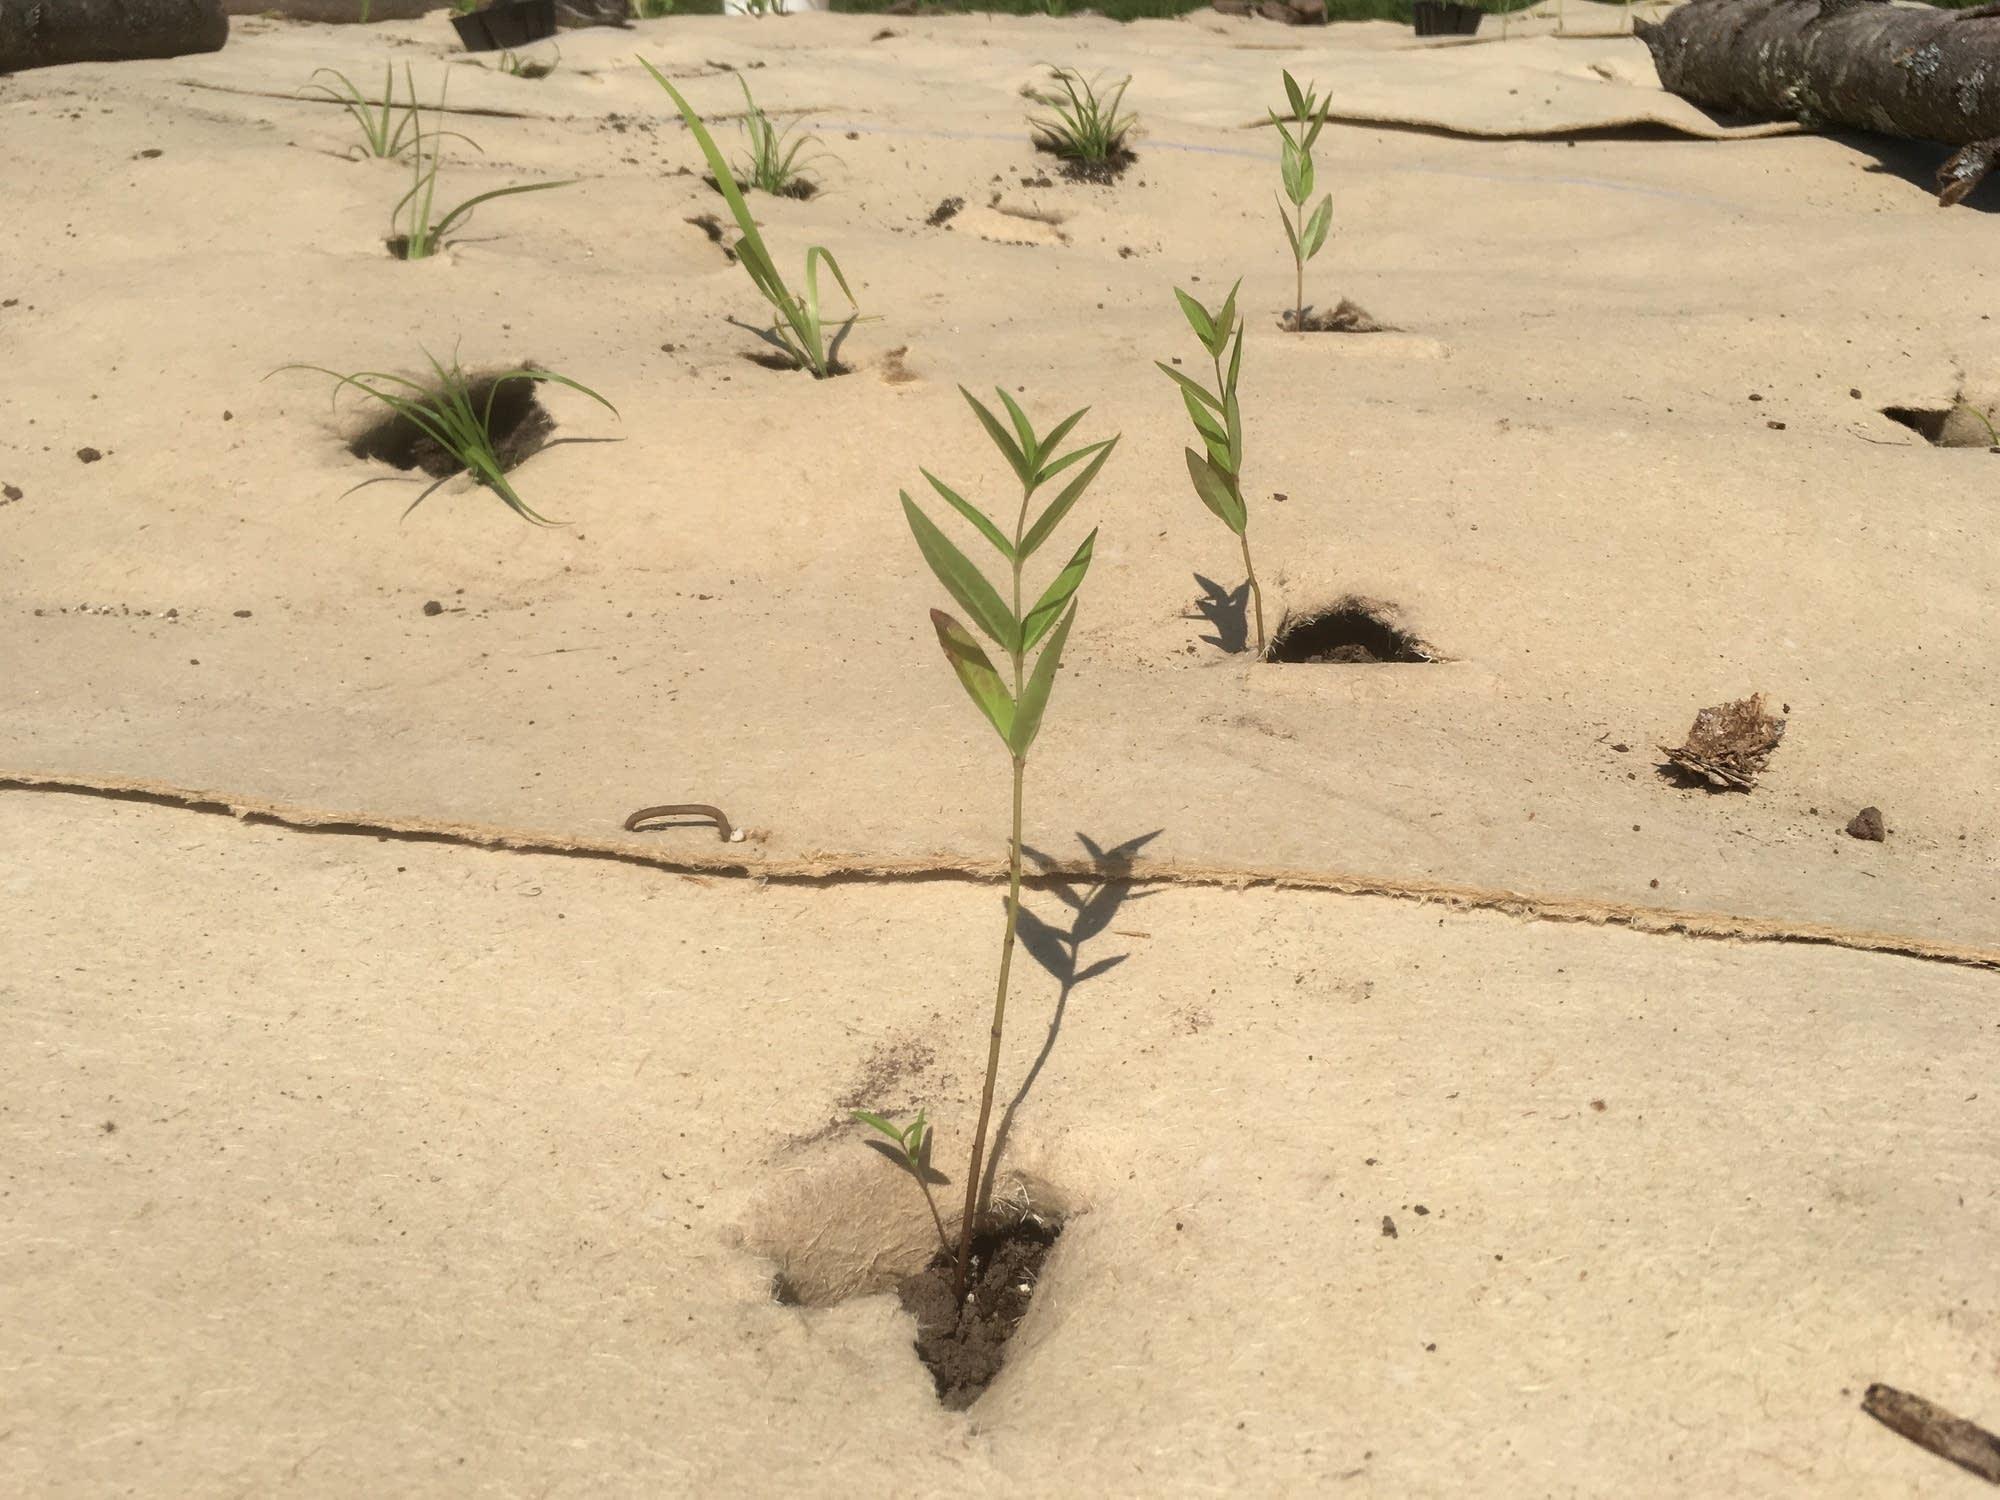 A tiny milkweed plant